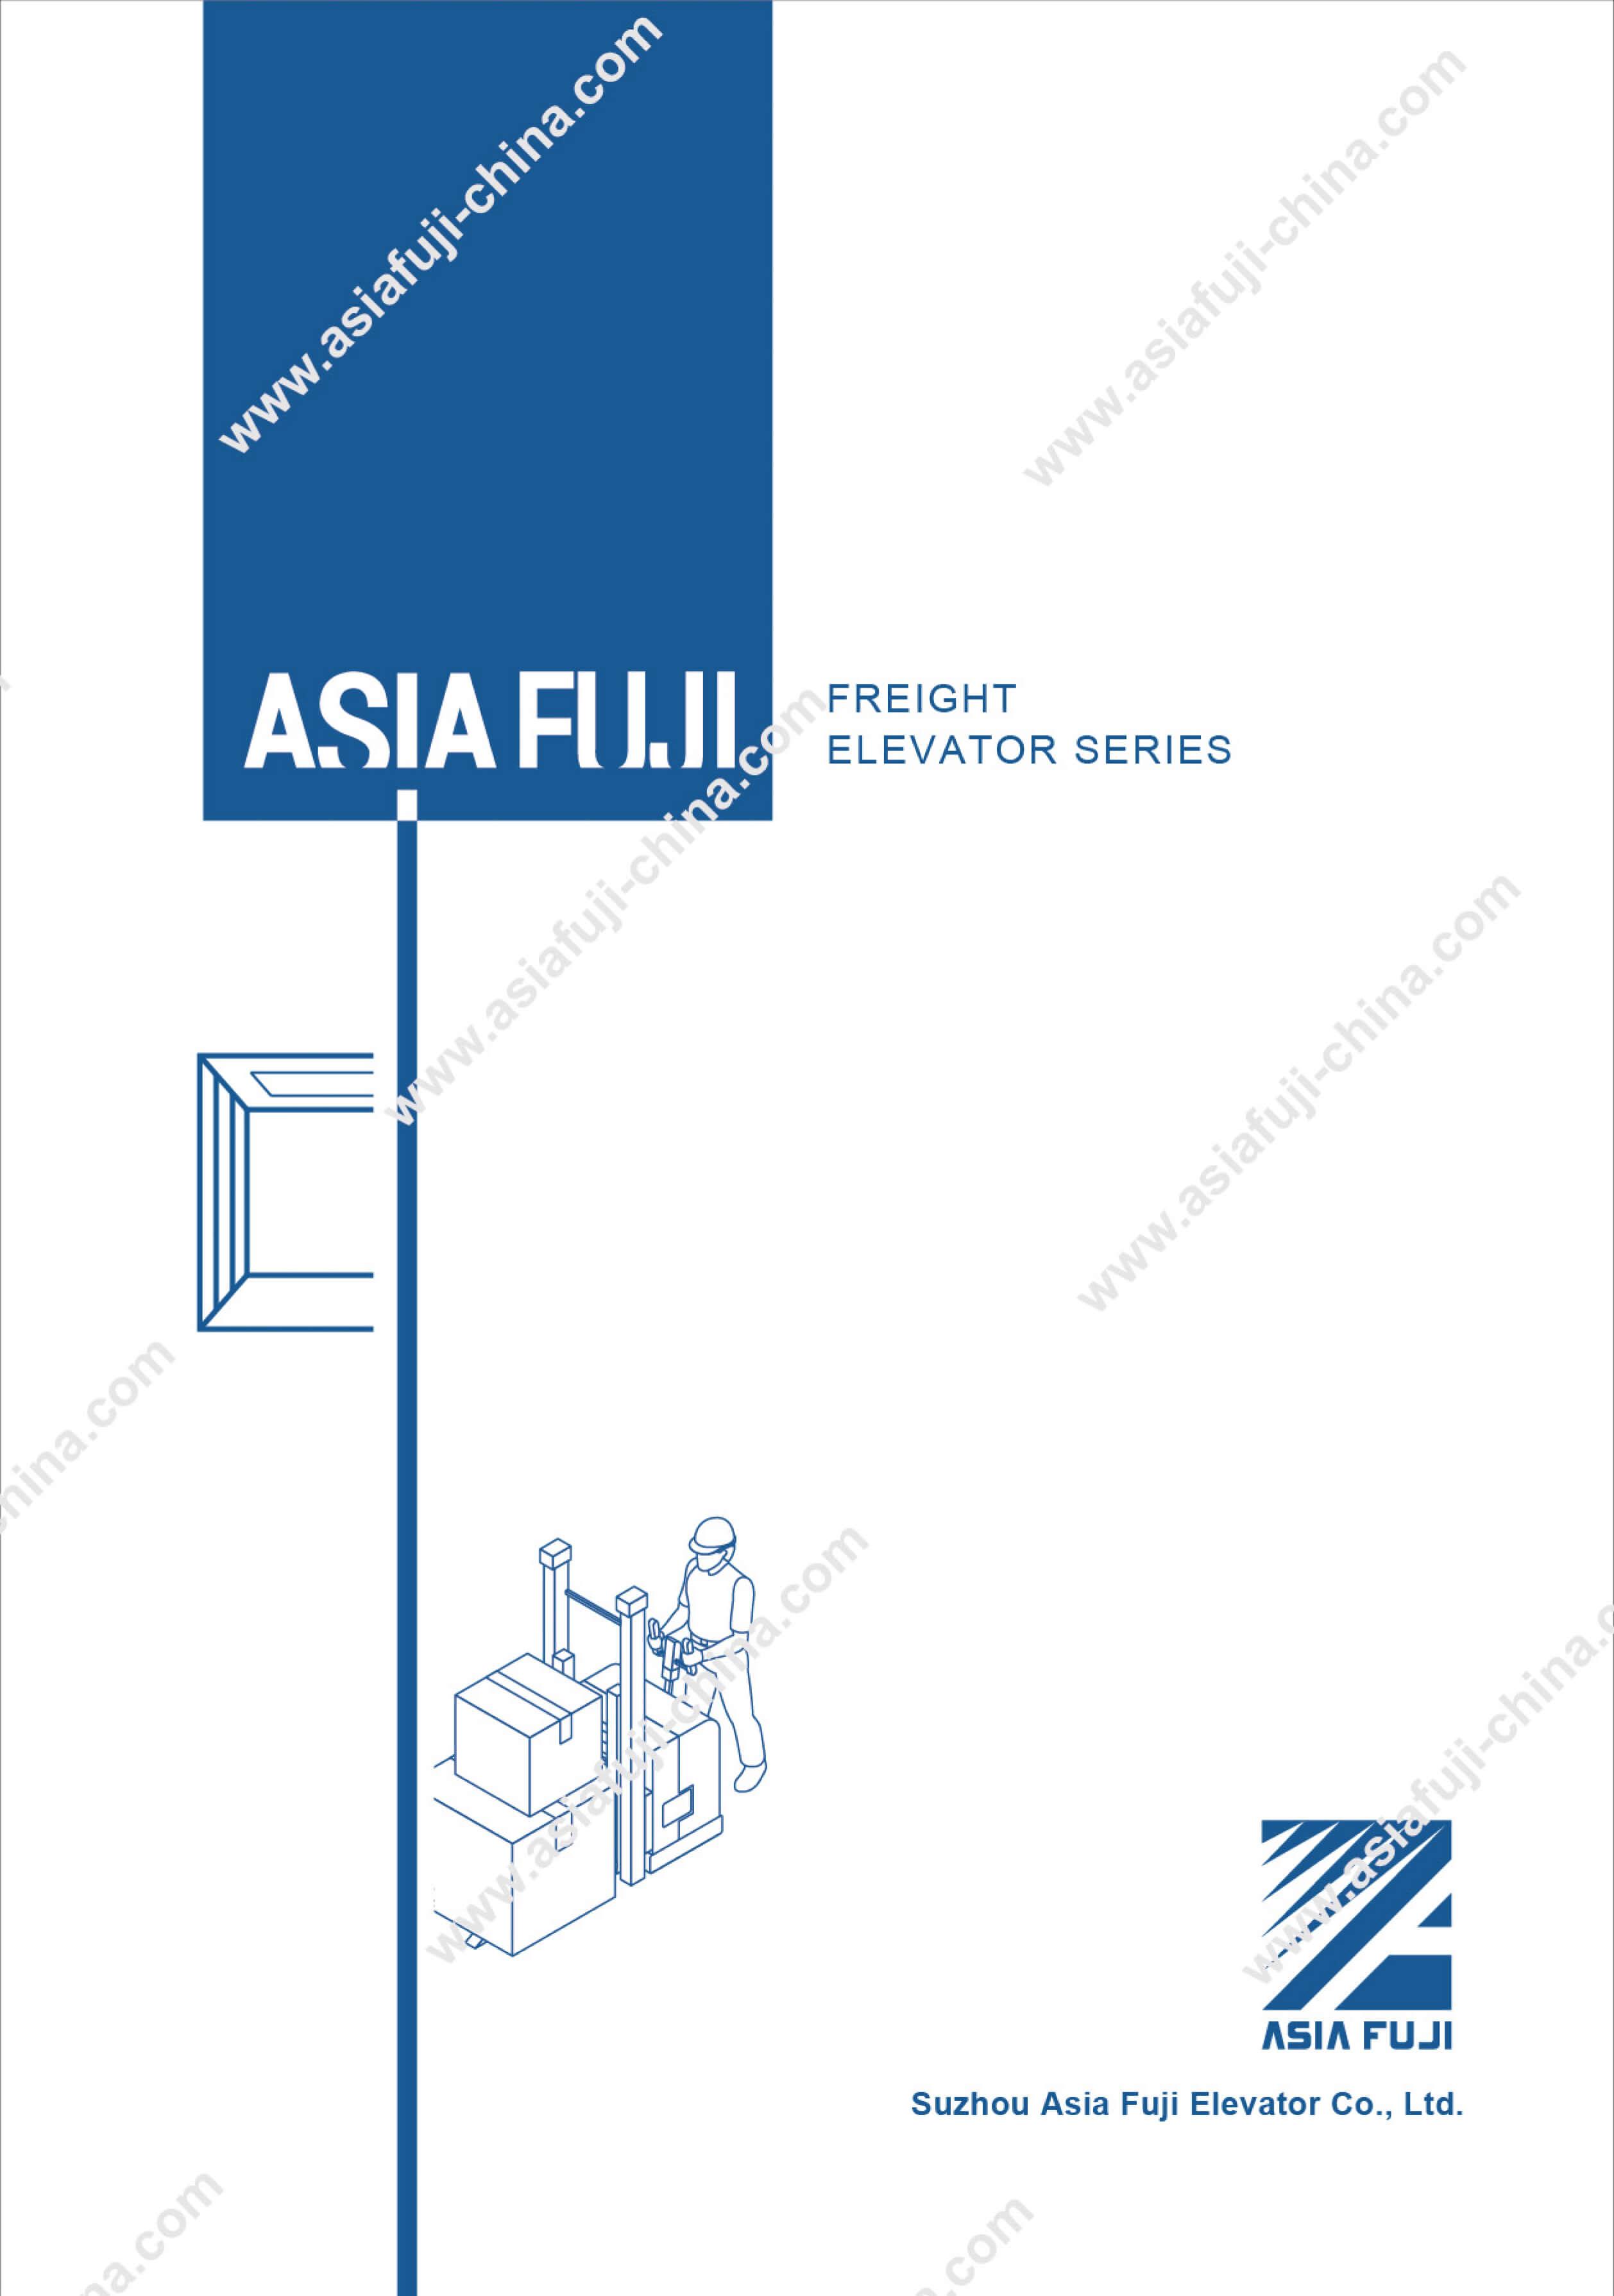 FUJI-Freight-Lift-1